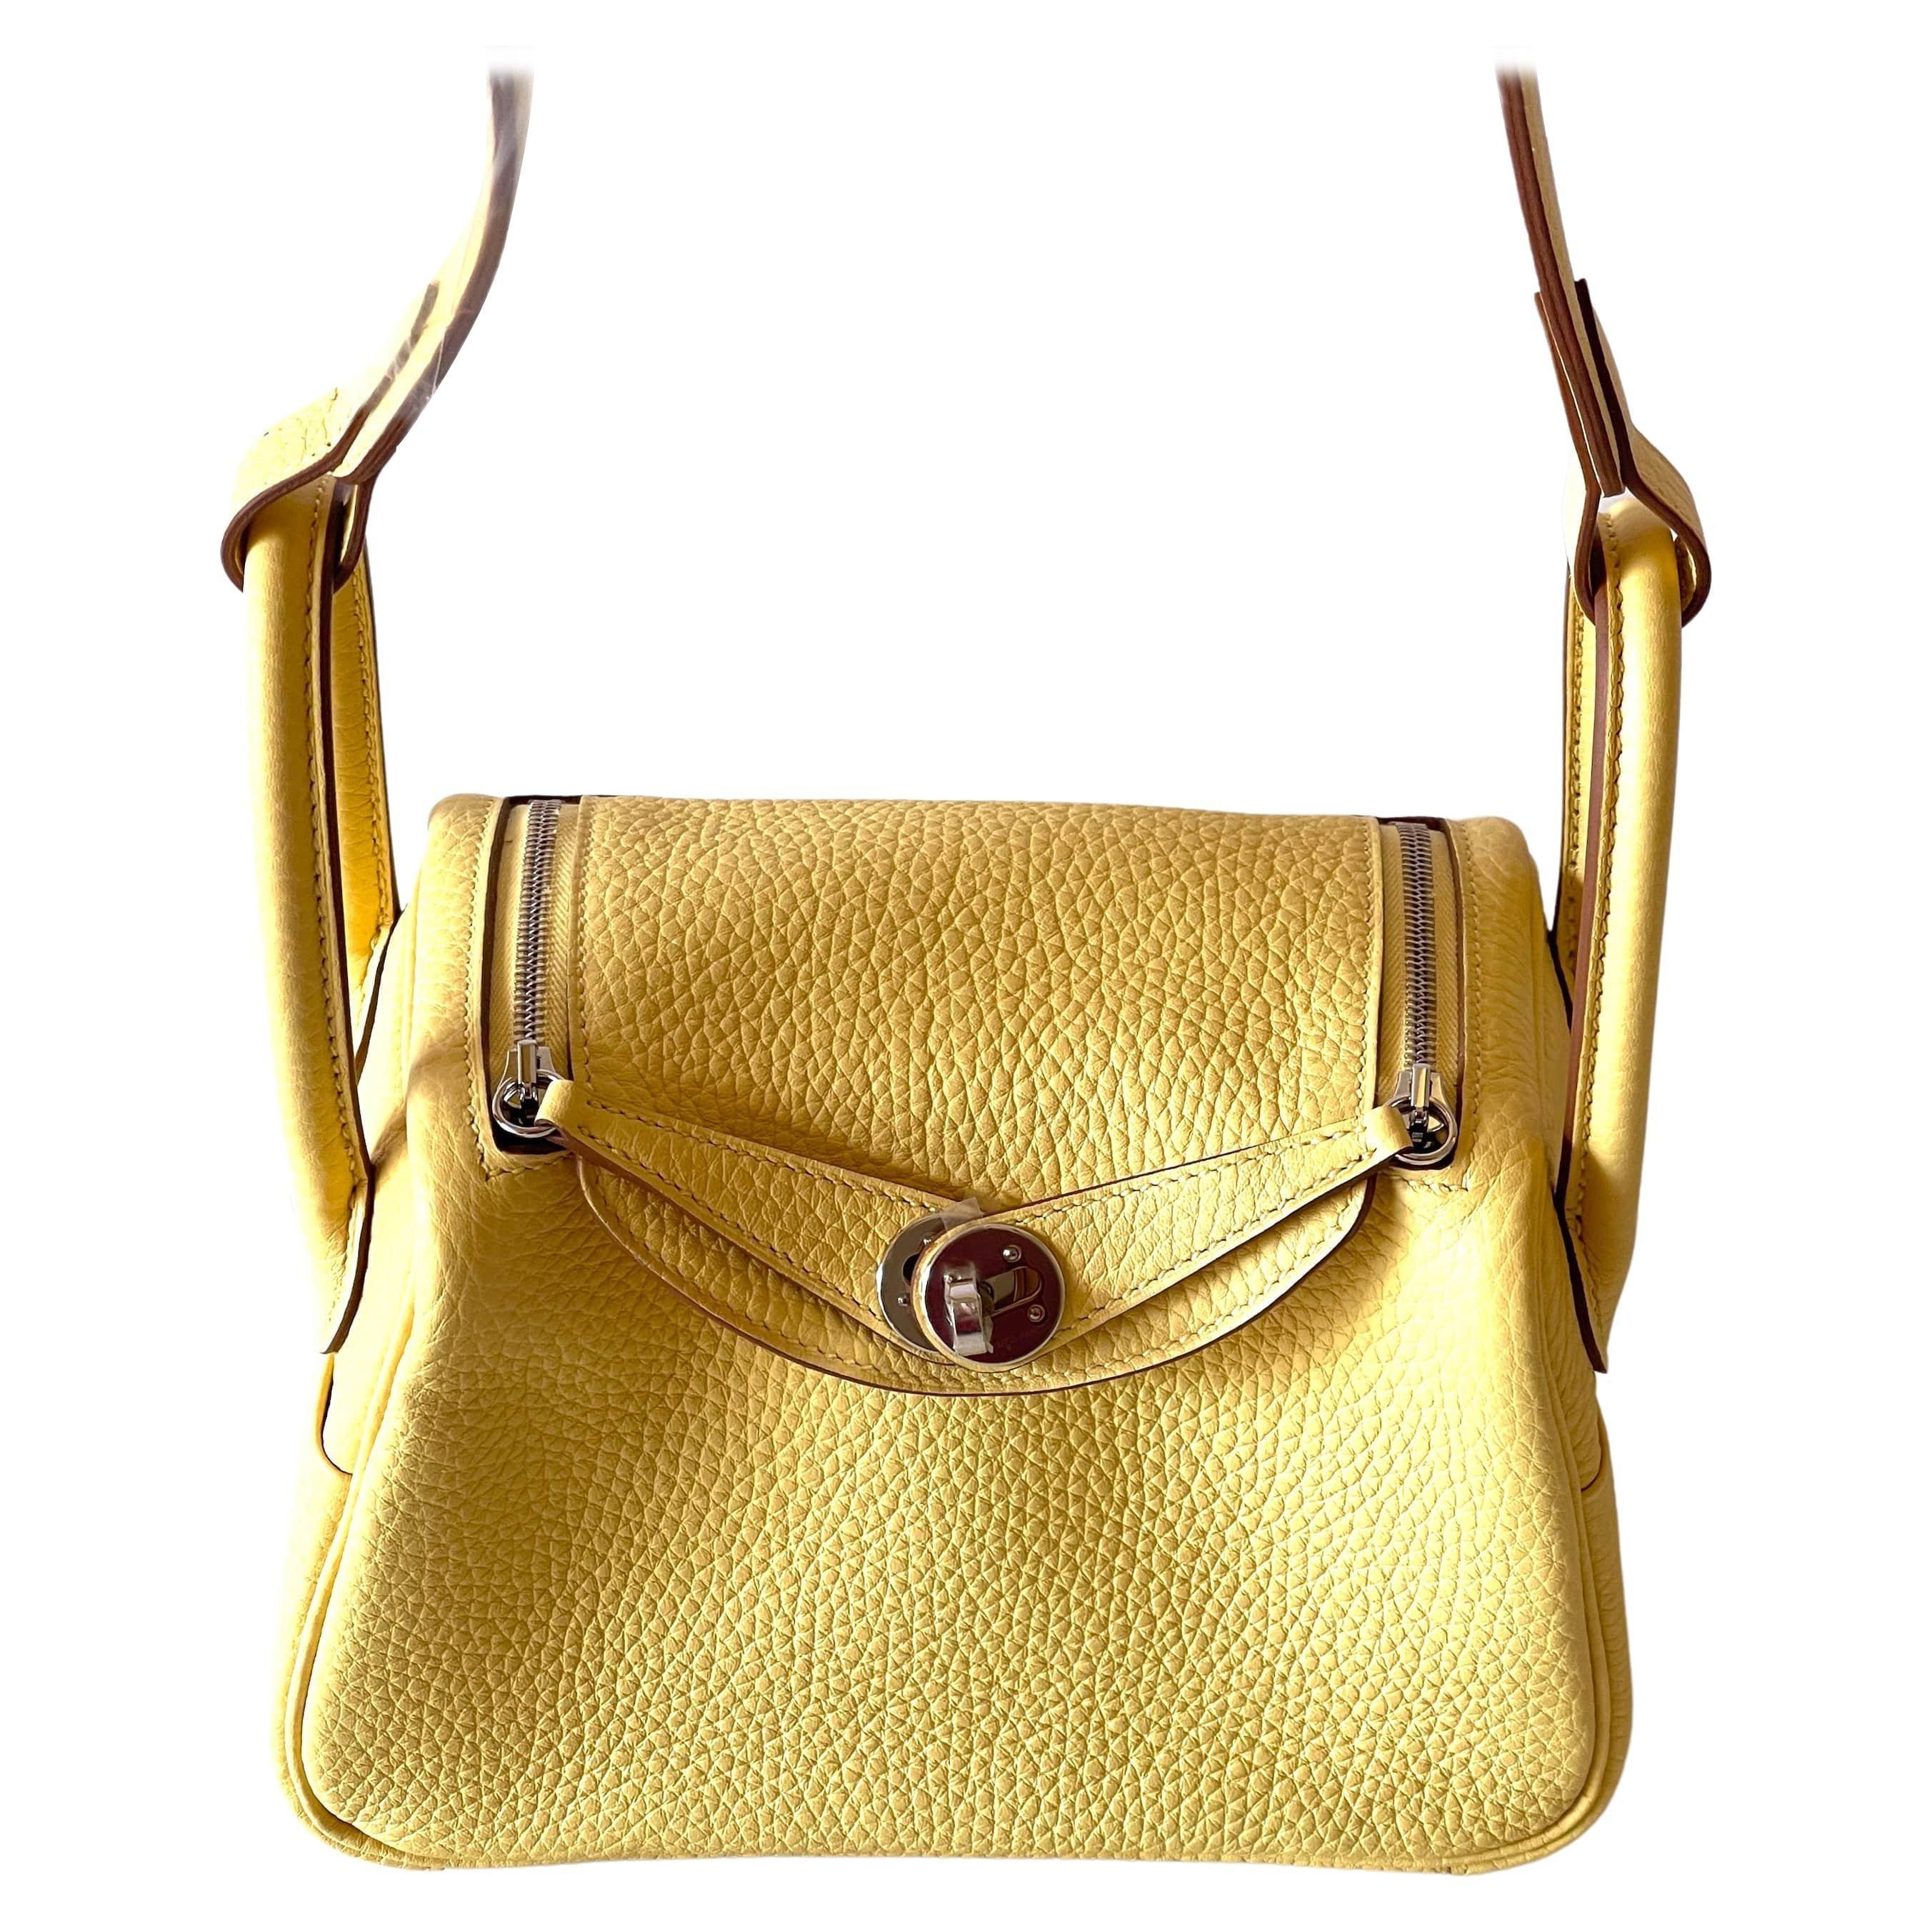 Hermes Mini Lindy Juane Poussin Buttery Yellow Handbag Bag